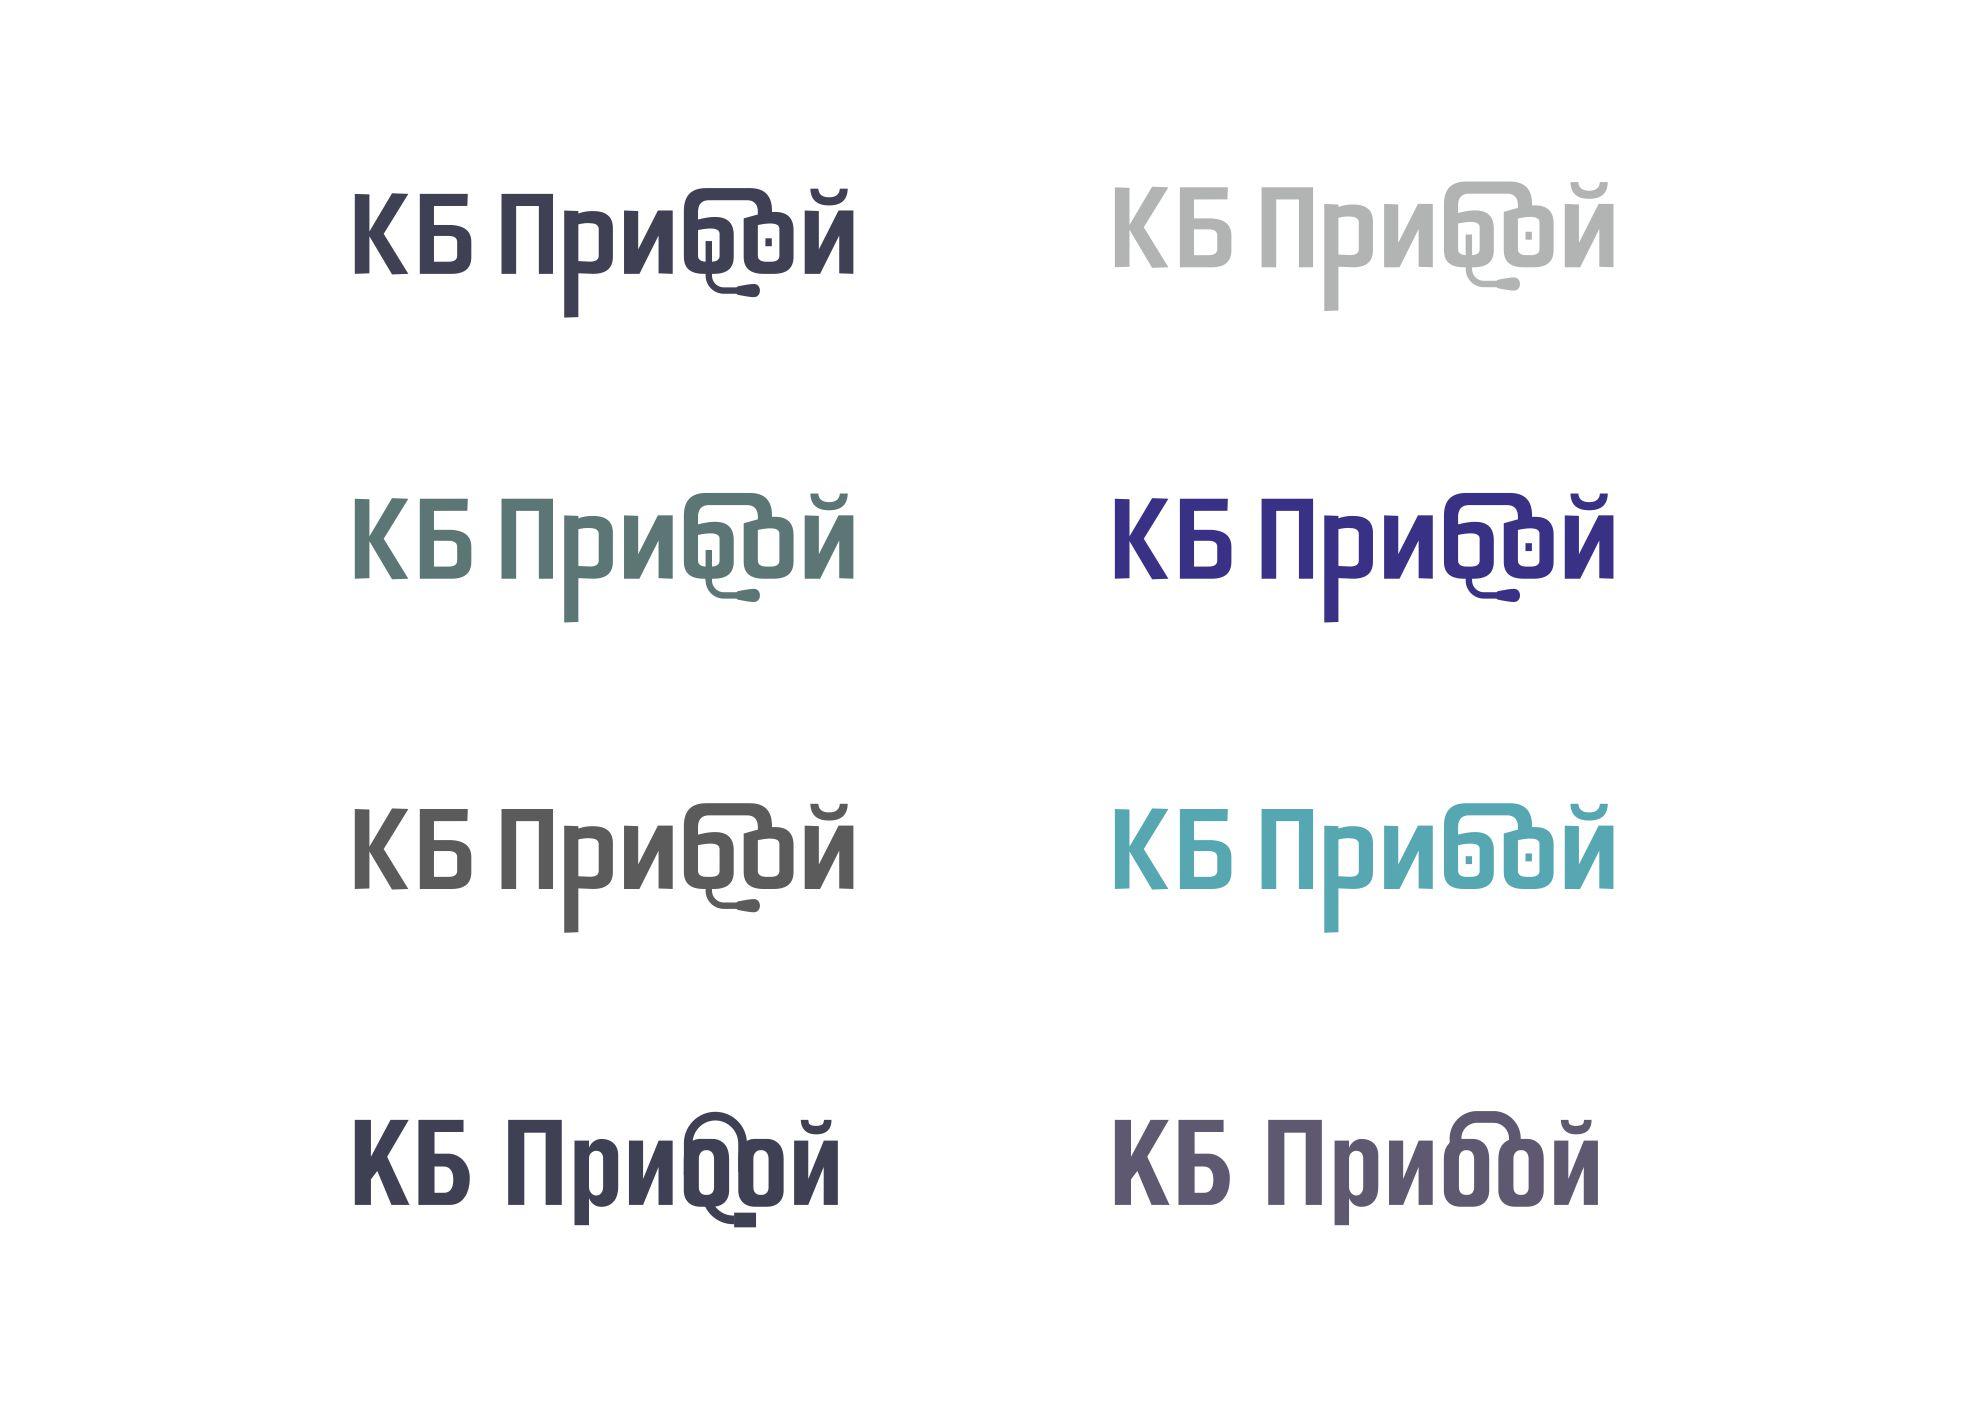 Разработка логотипа и фирменного стиля для КБ Прибой фото f_7375b28c5677a234.jpg